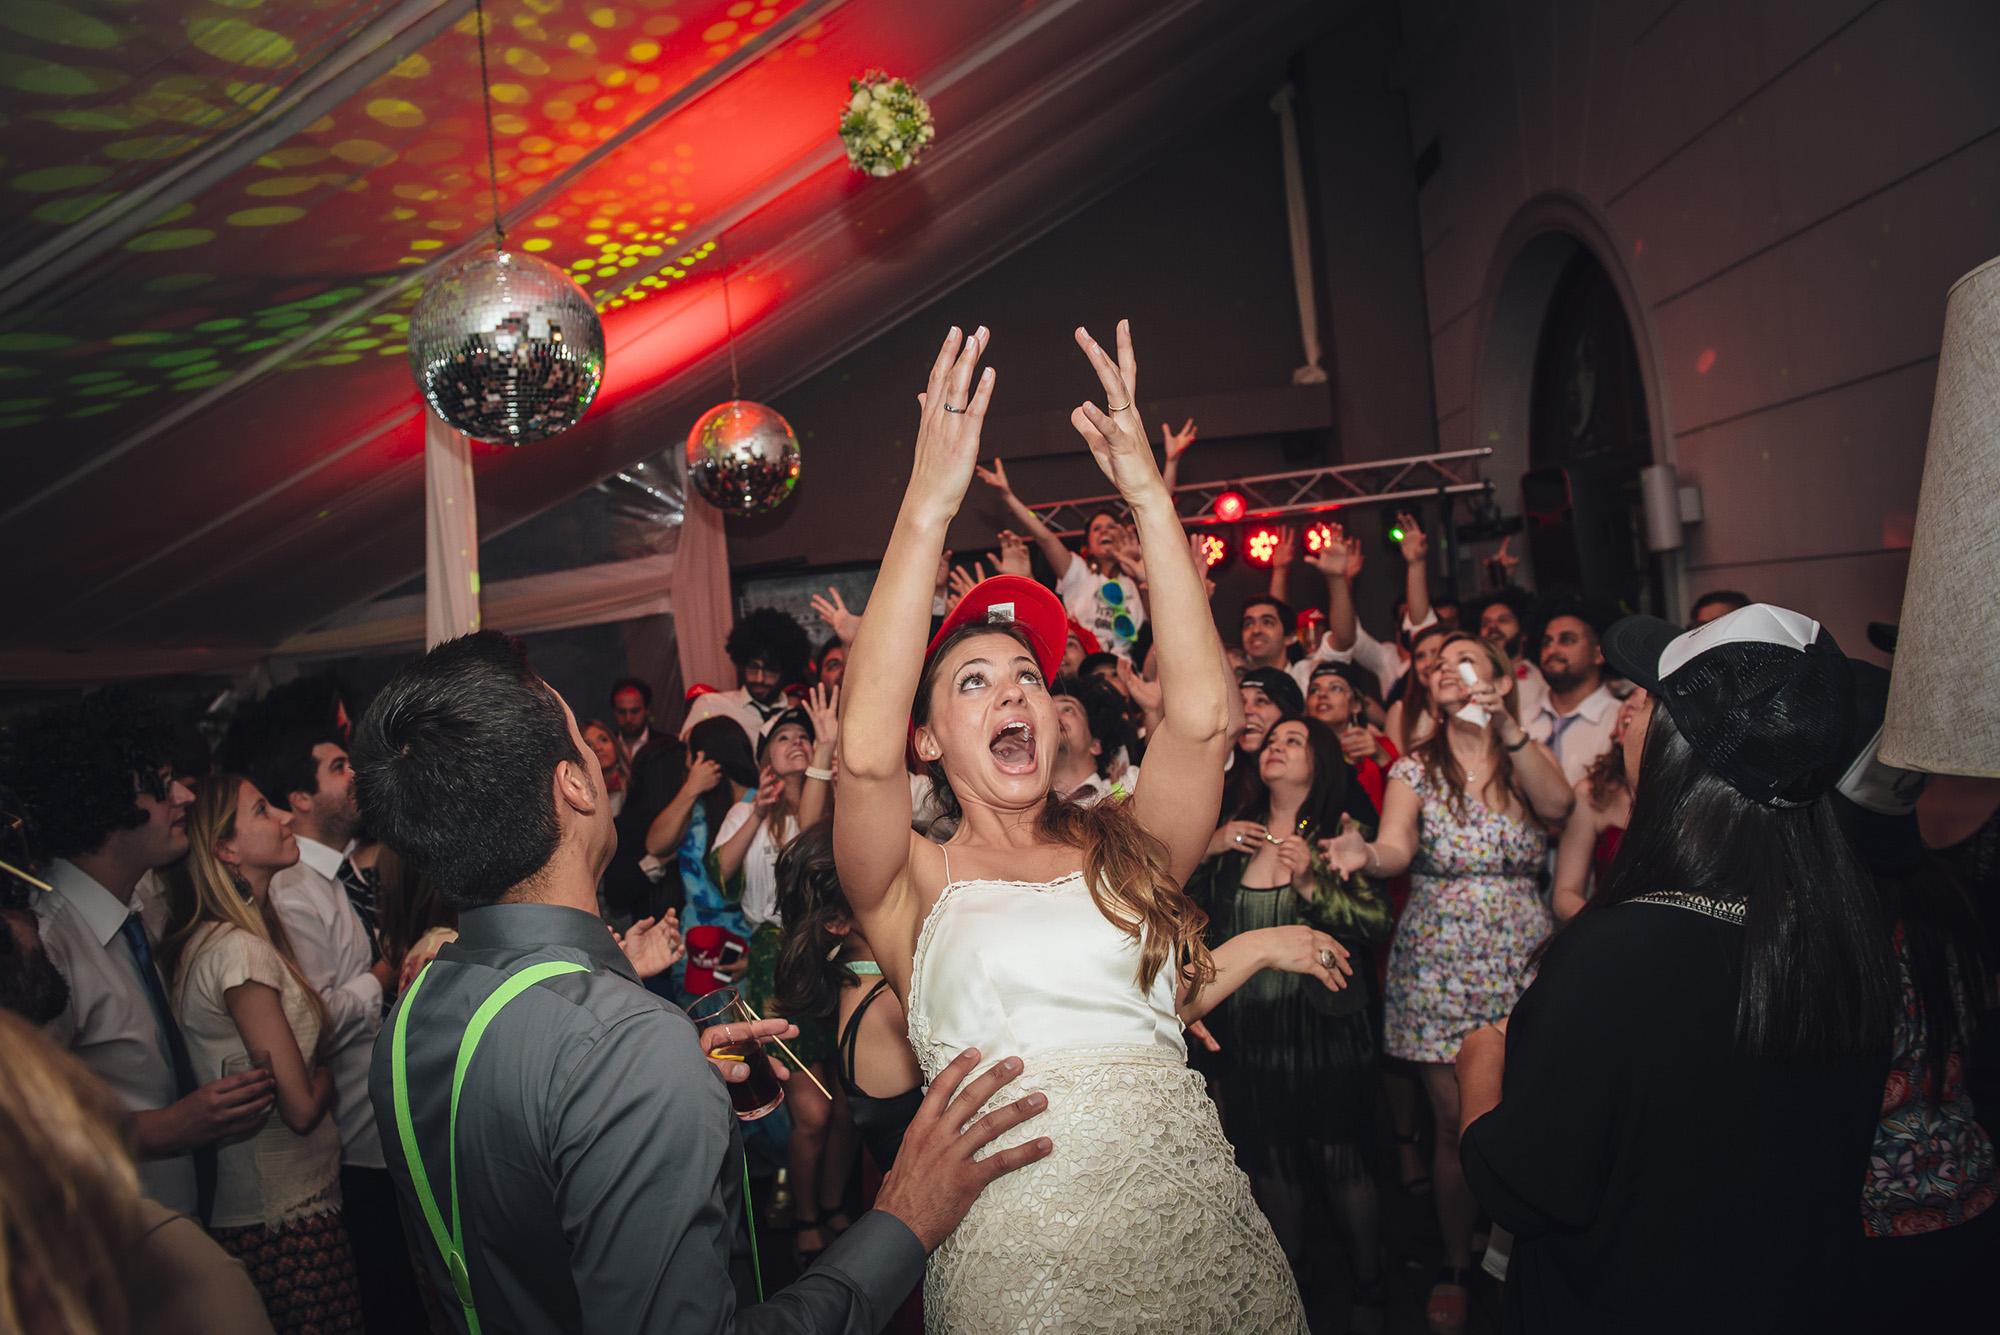 patricia-riba-casamiento-montevideo-uruguay-lindolfo-73